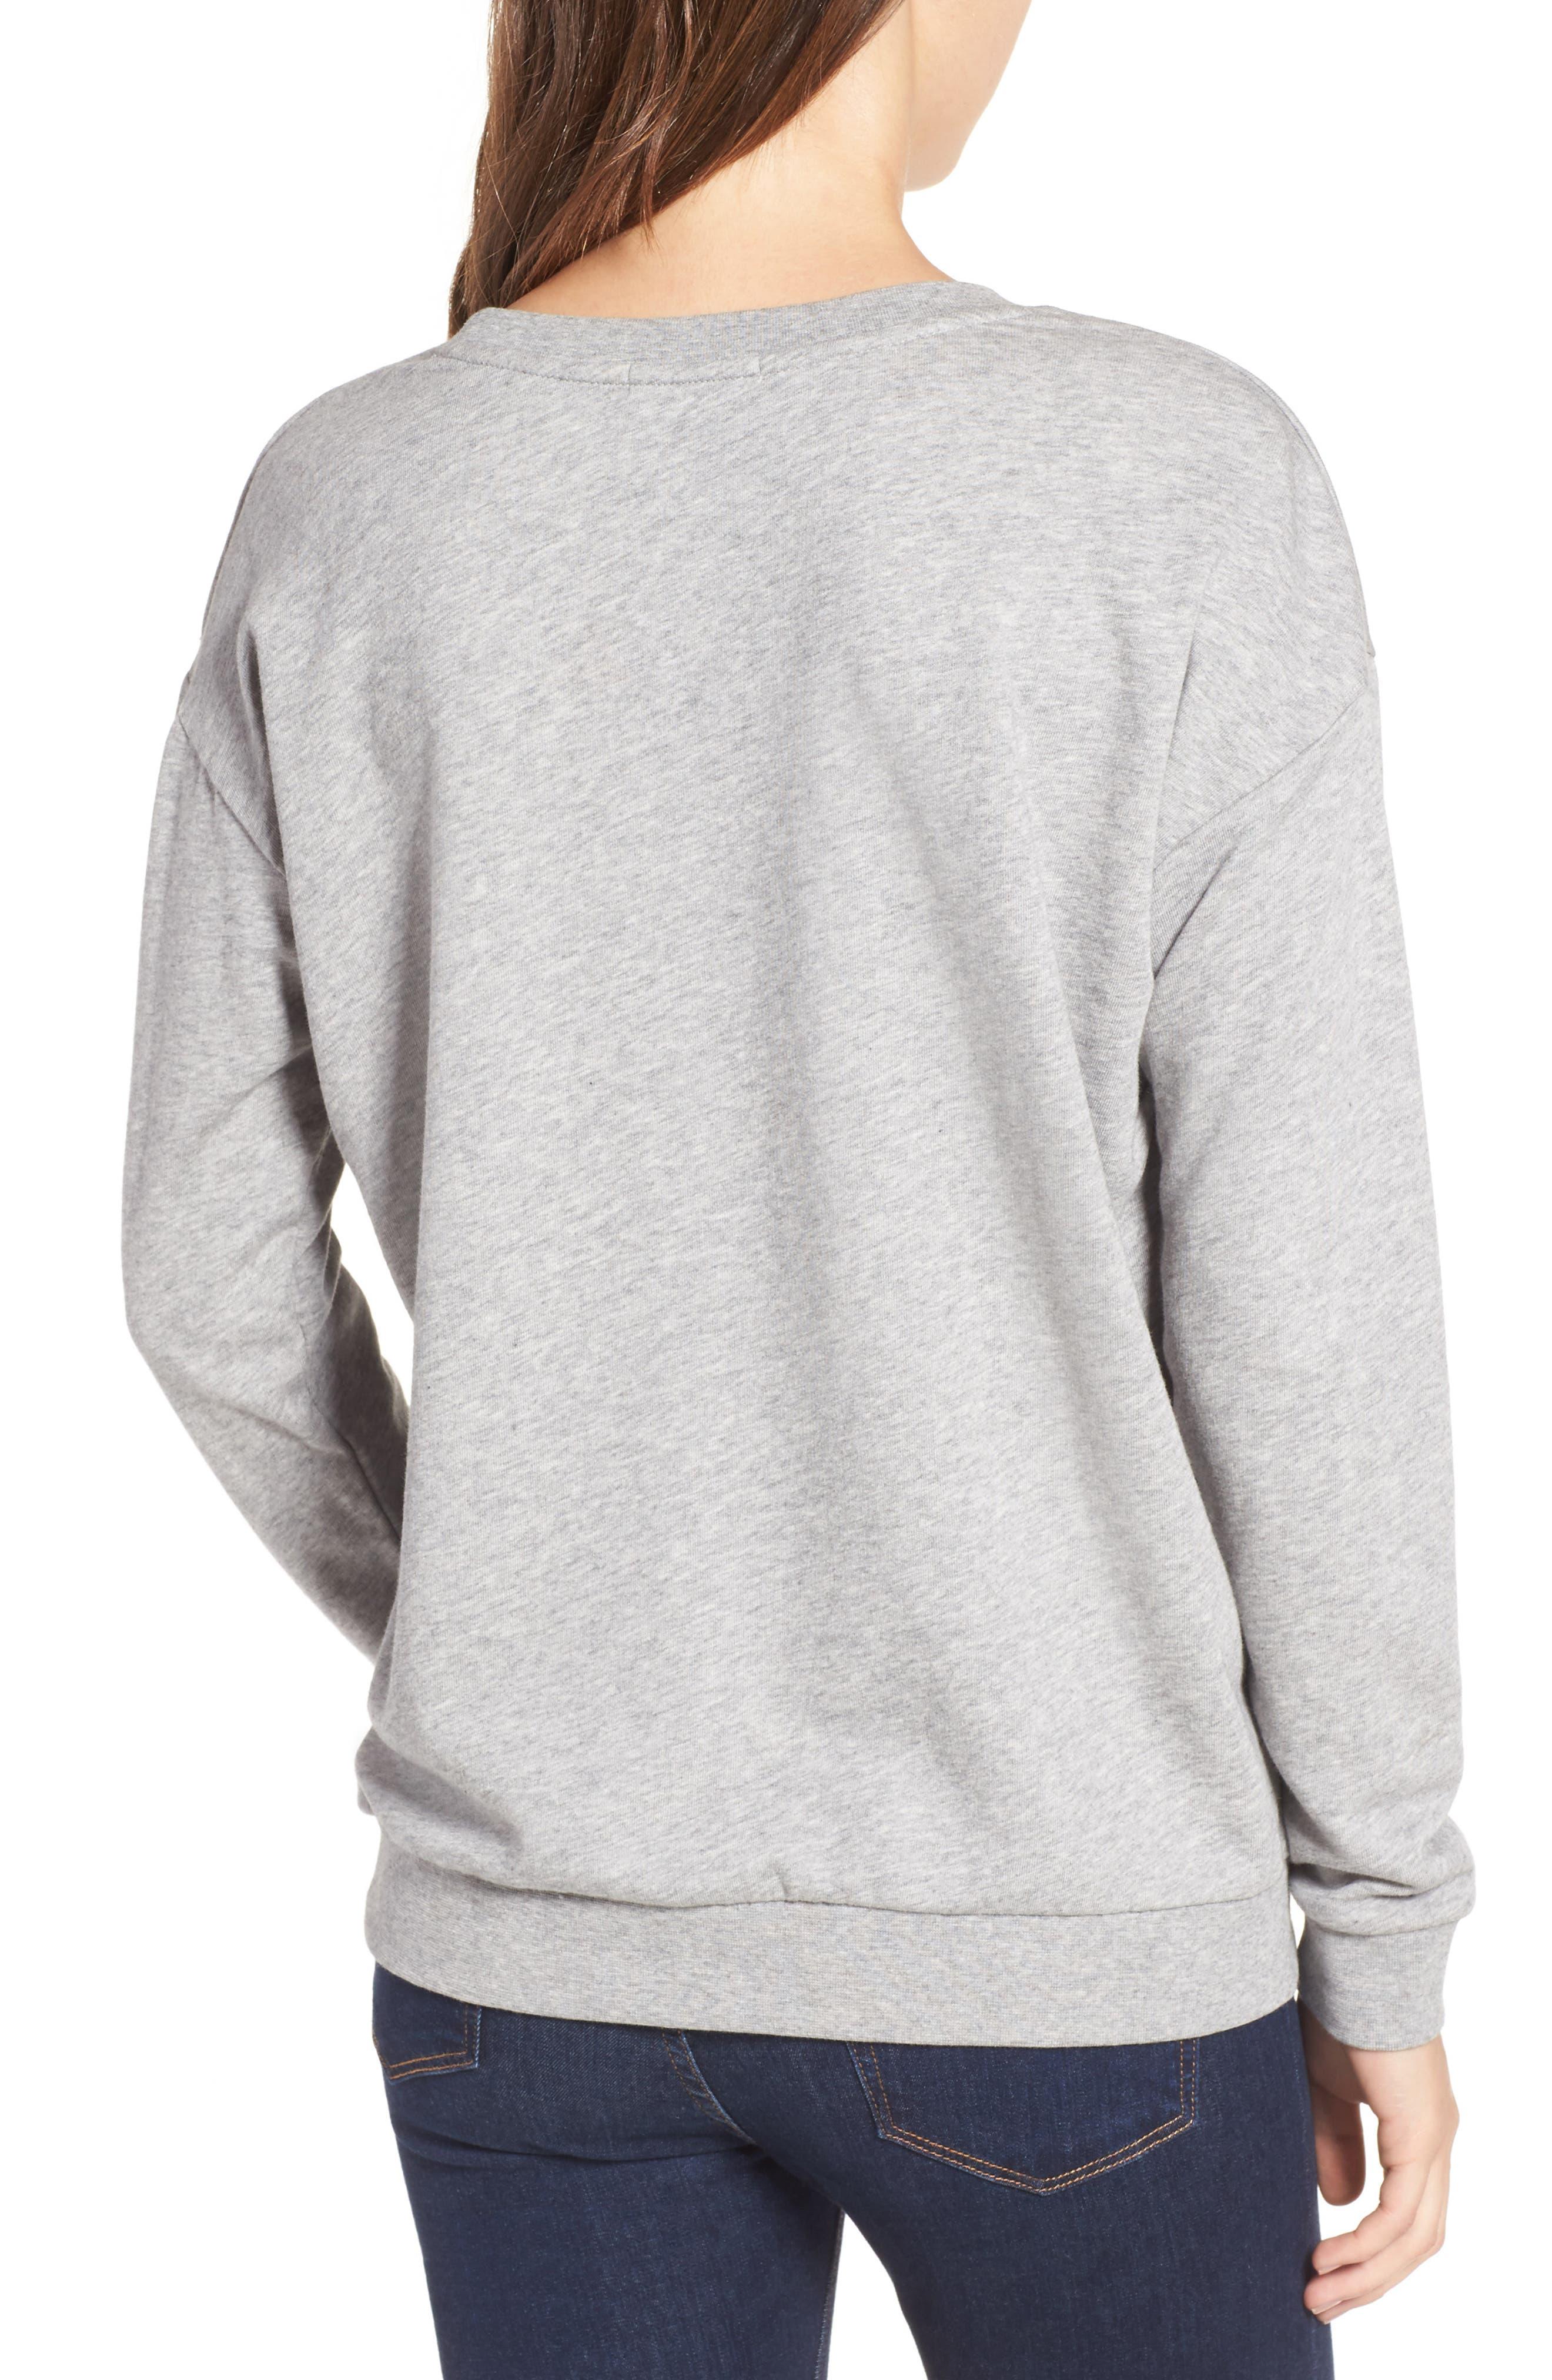 Pompom Sweatshirt,                             Alternate thumbnail 2, color,                             Grey